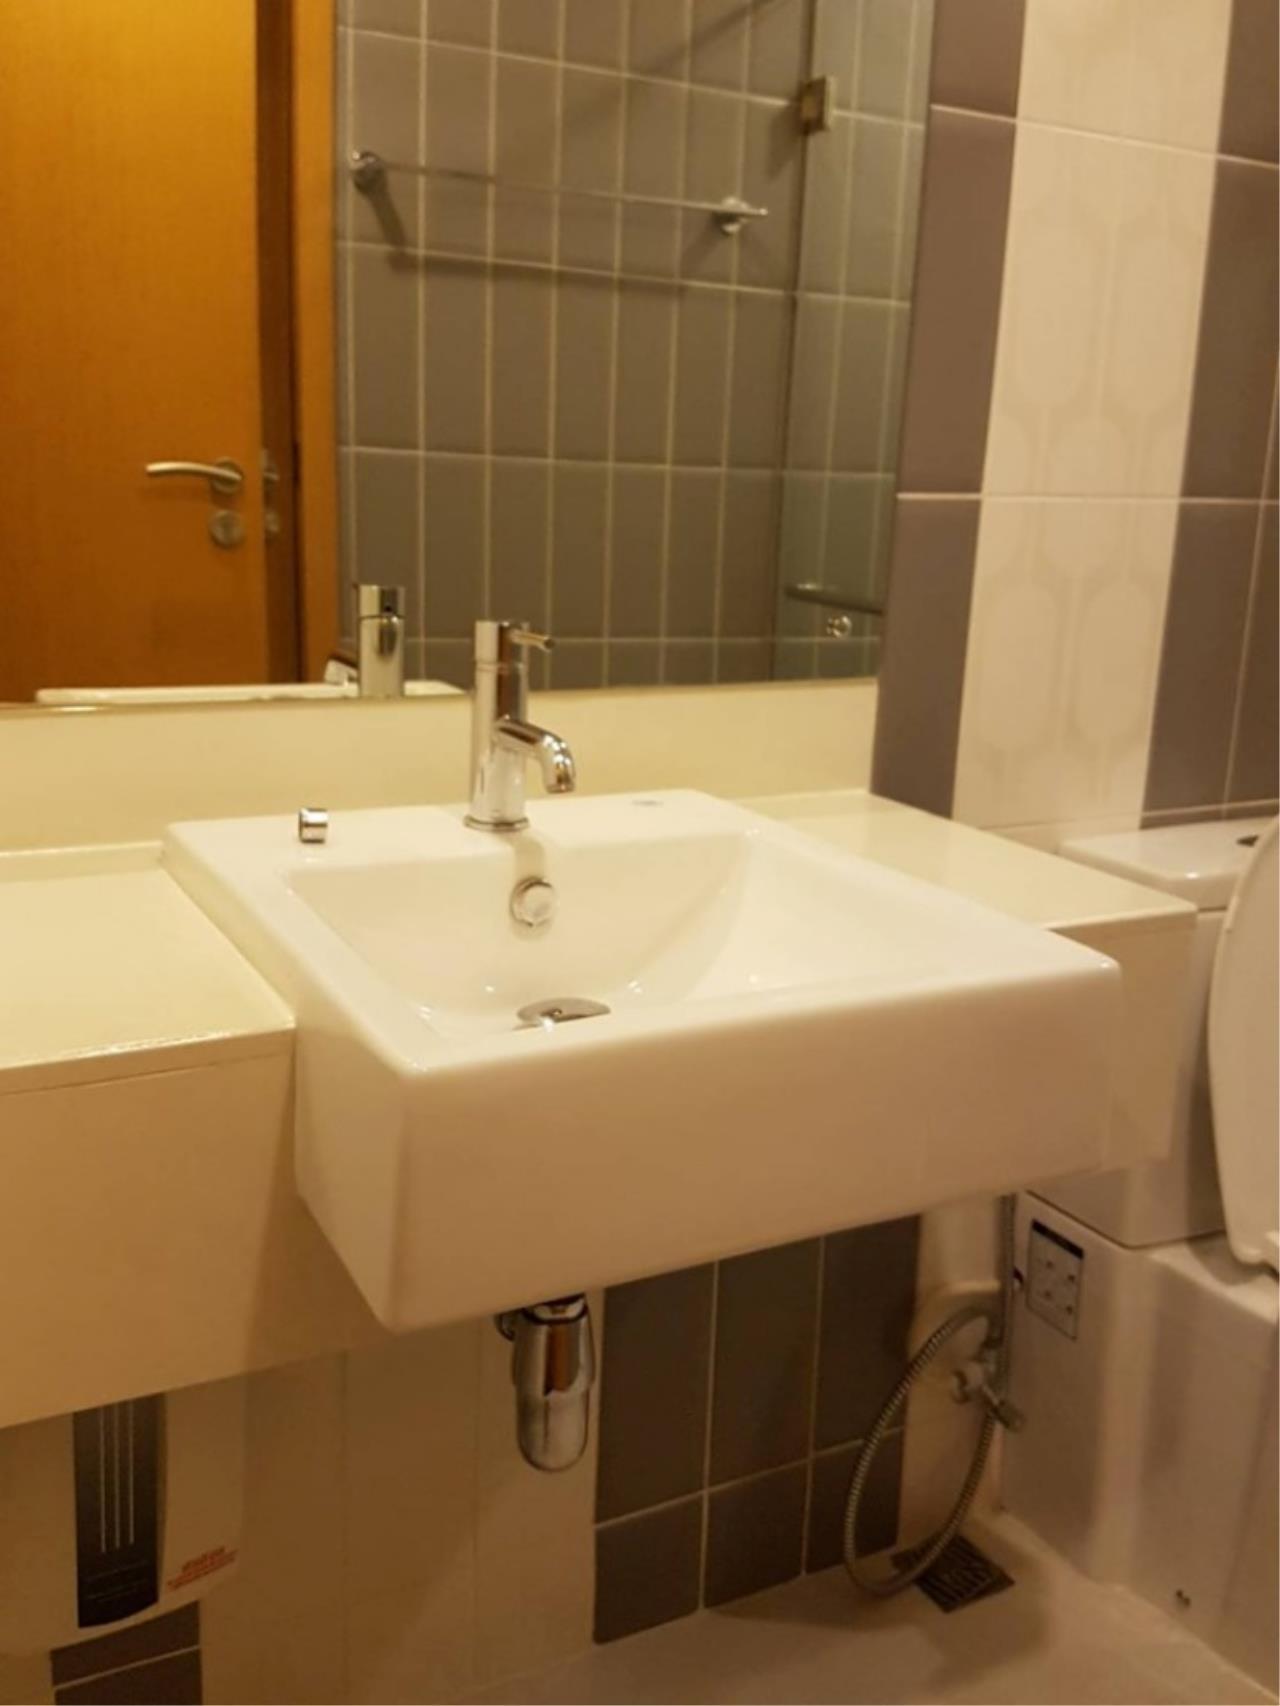 Century21 Skylux Agency's Circle Condominium / Condo For Rent / 1 Bedroom / 45 SQM / BTS Nana / Bangkok 7